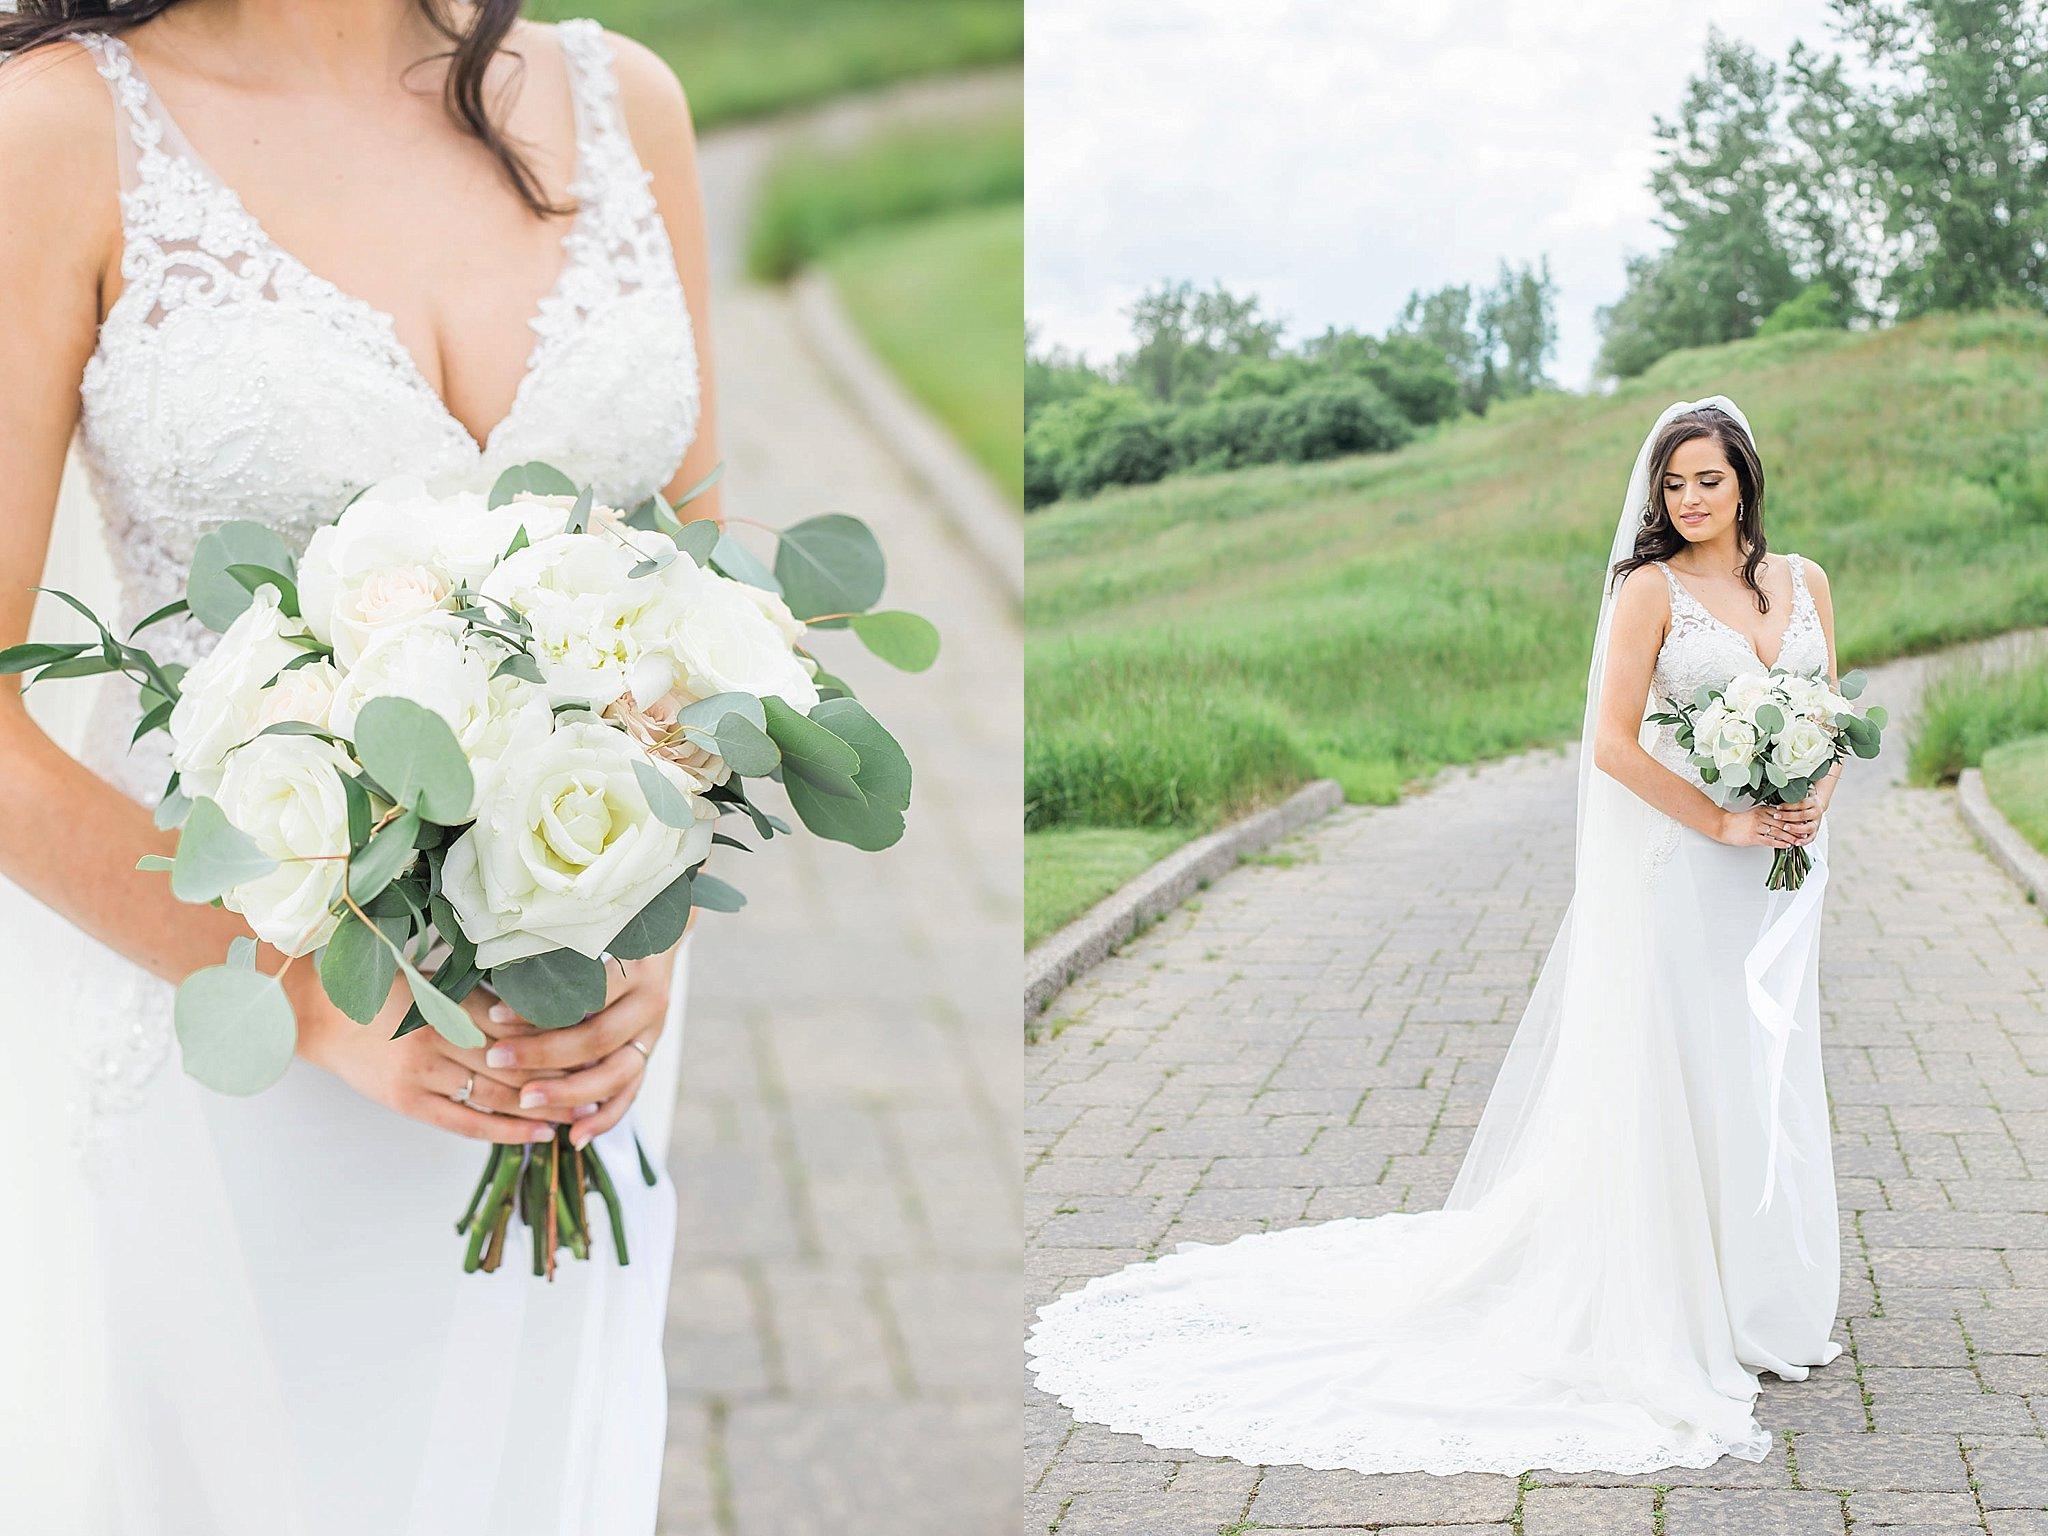 Toronto Wedding Photography, Film Photography, Niagara Film Photographer